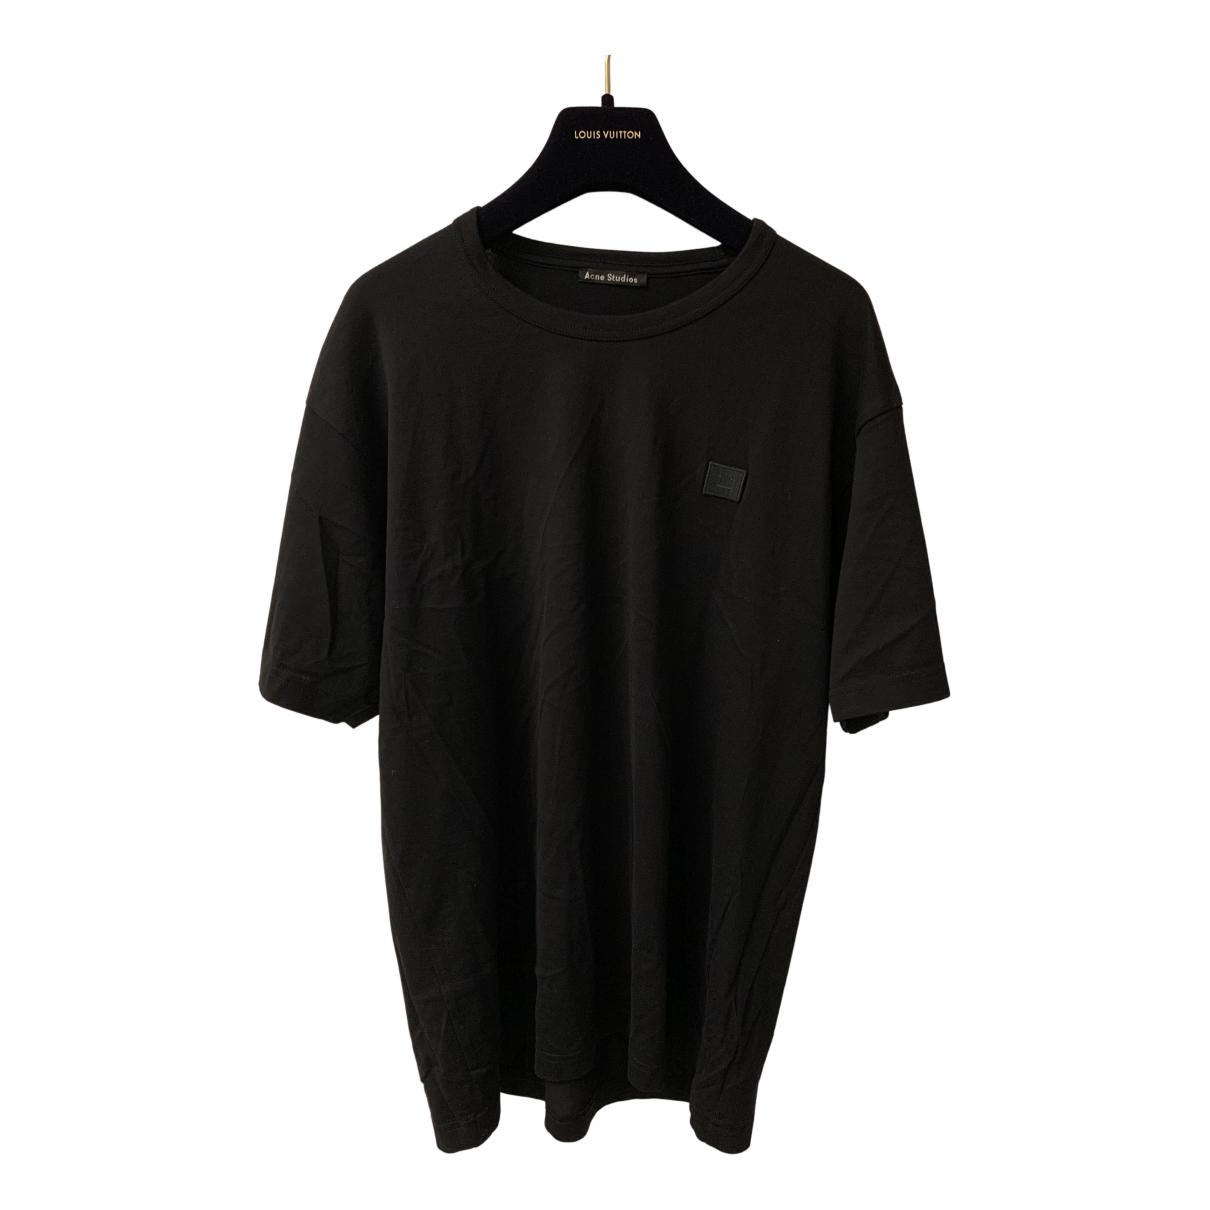 Acne Studios \N T-Shirts in  Schwarz Baumwolle